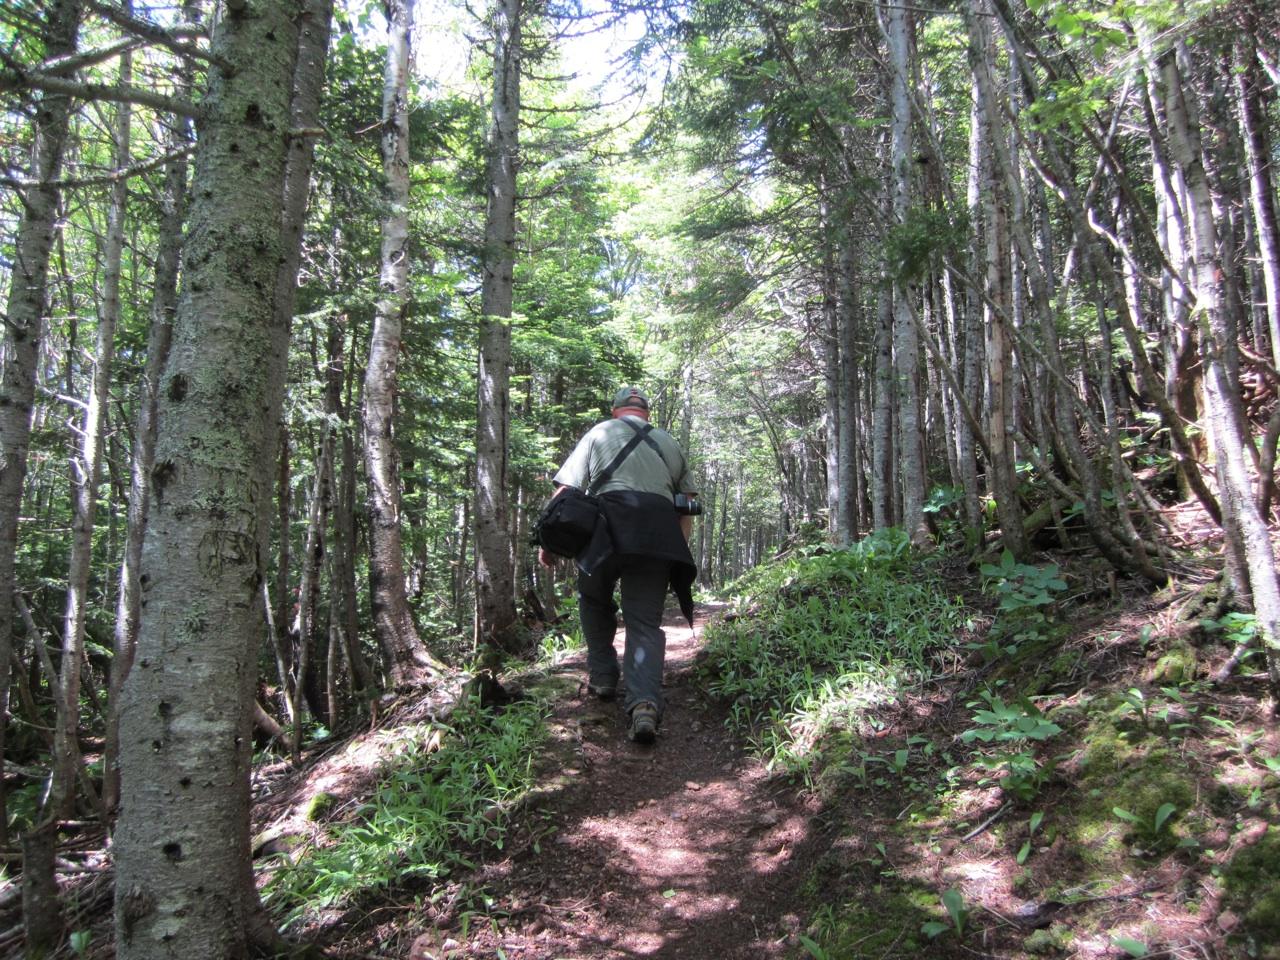 David Hiking The Trail